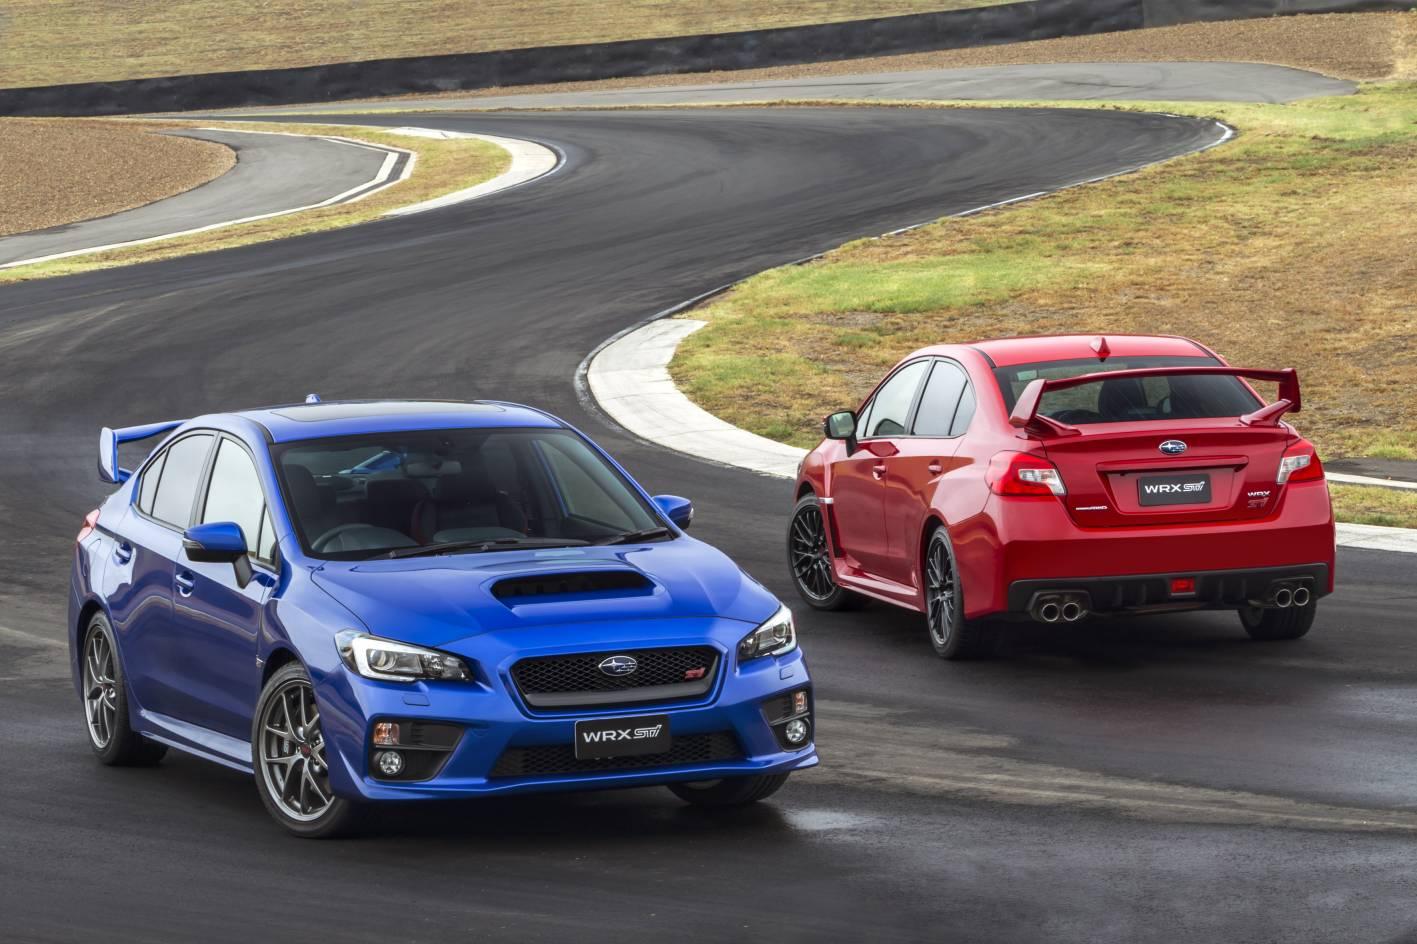 Subaru Cars - News: 2015 WRX STI pricing and specification